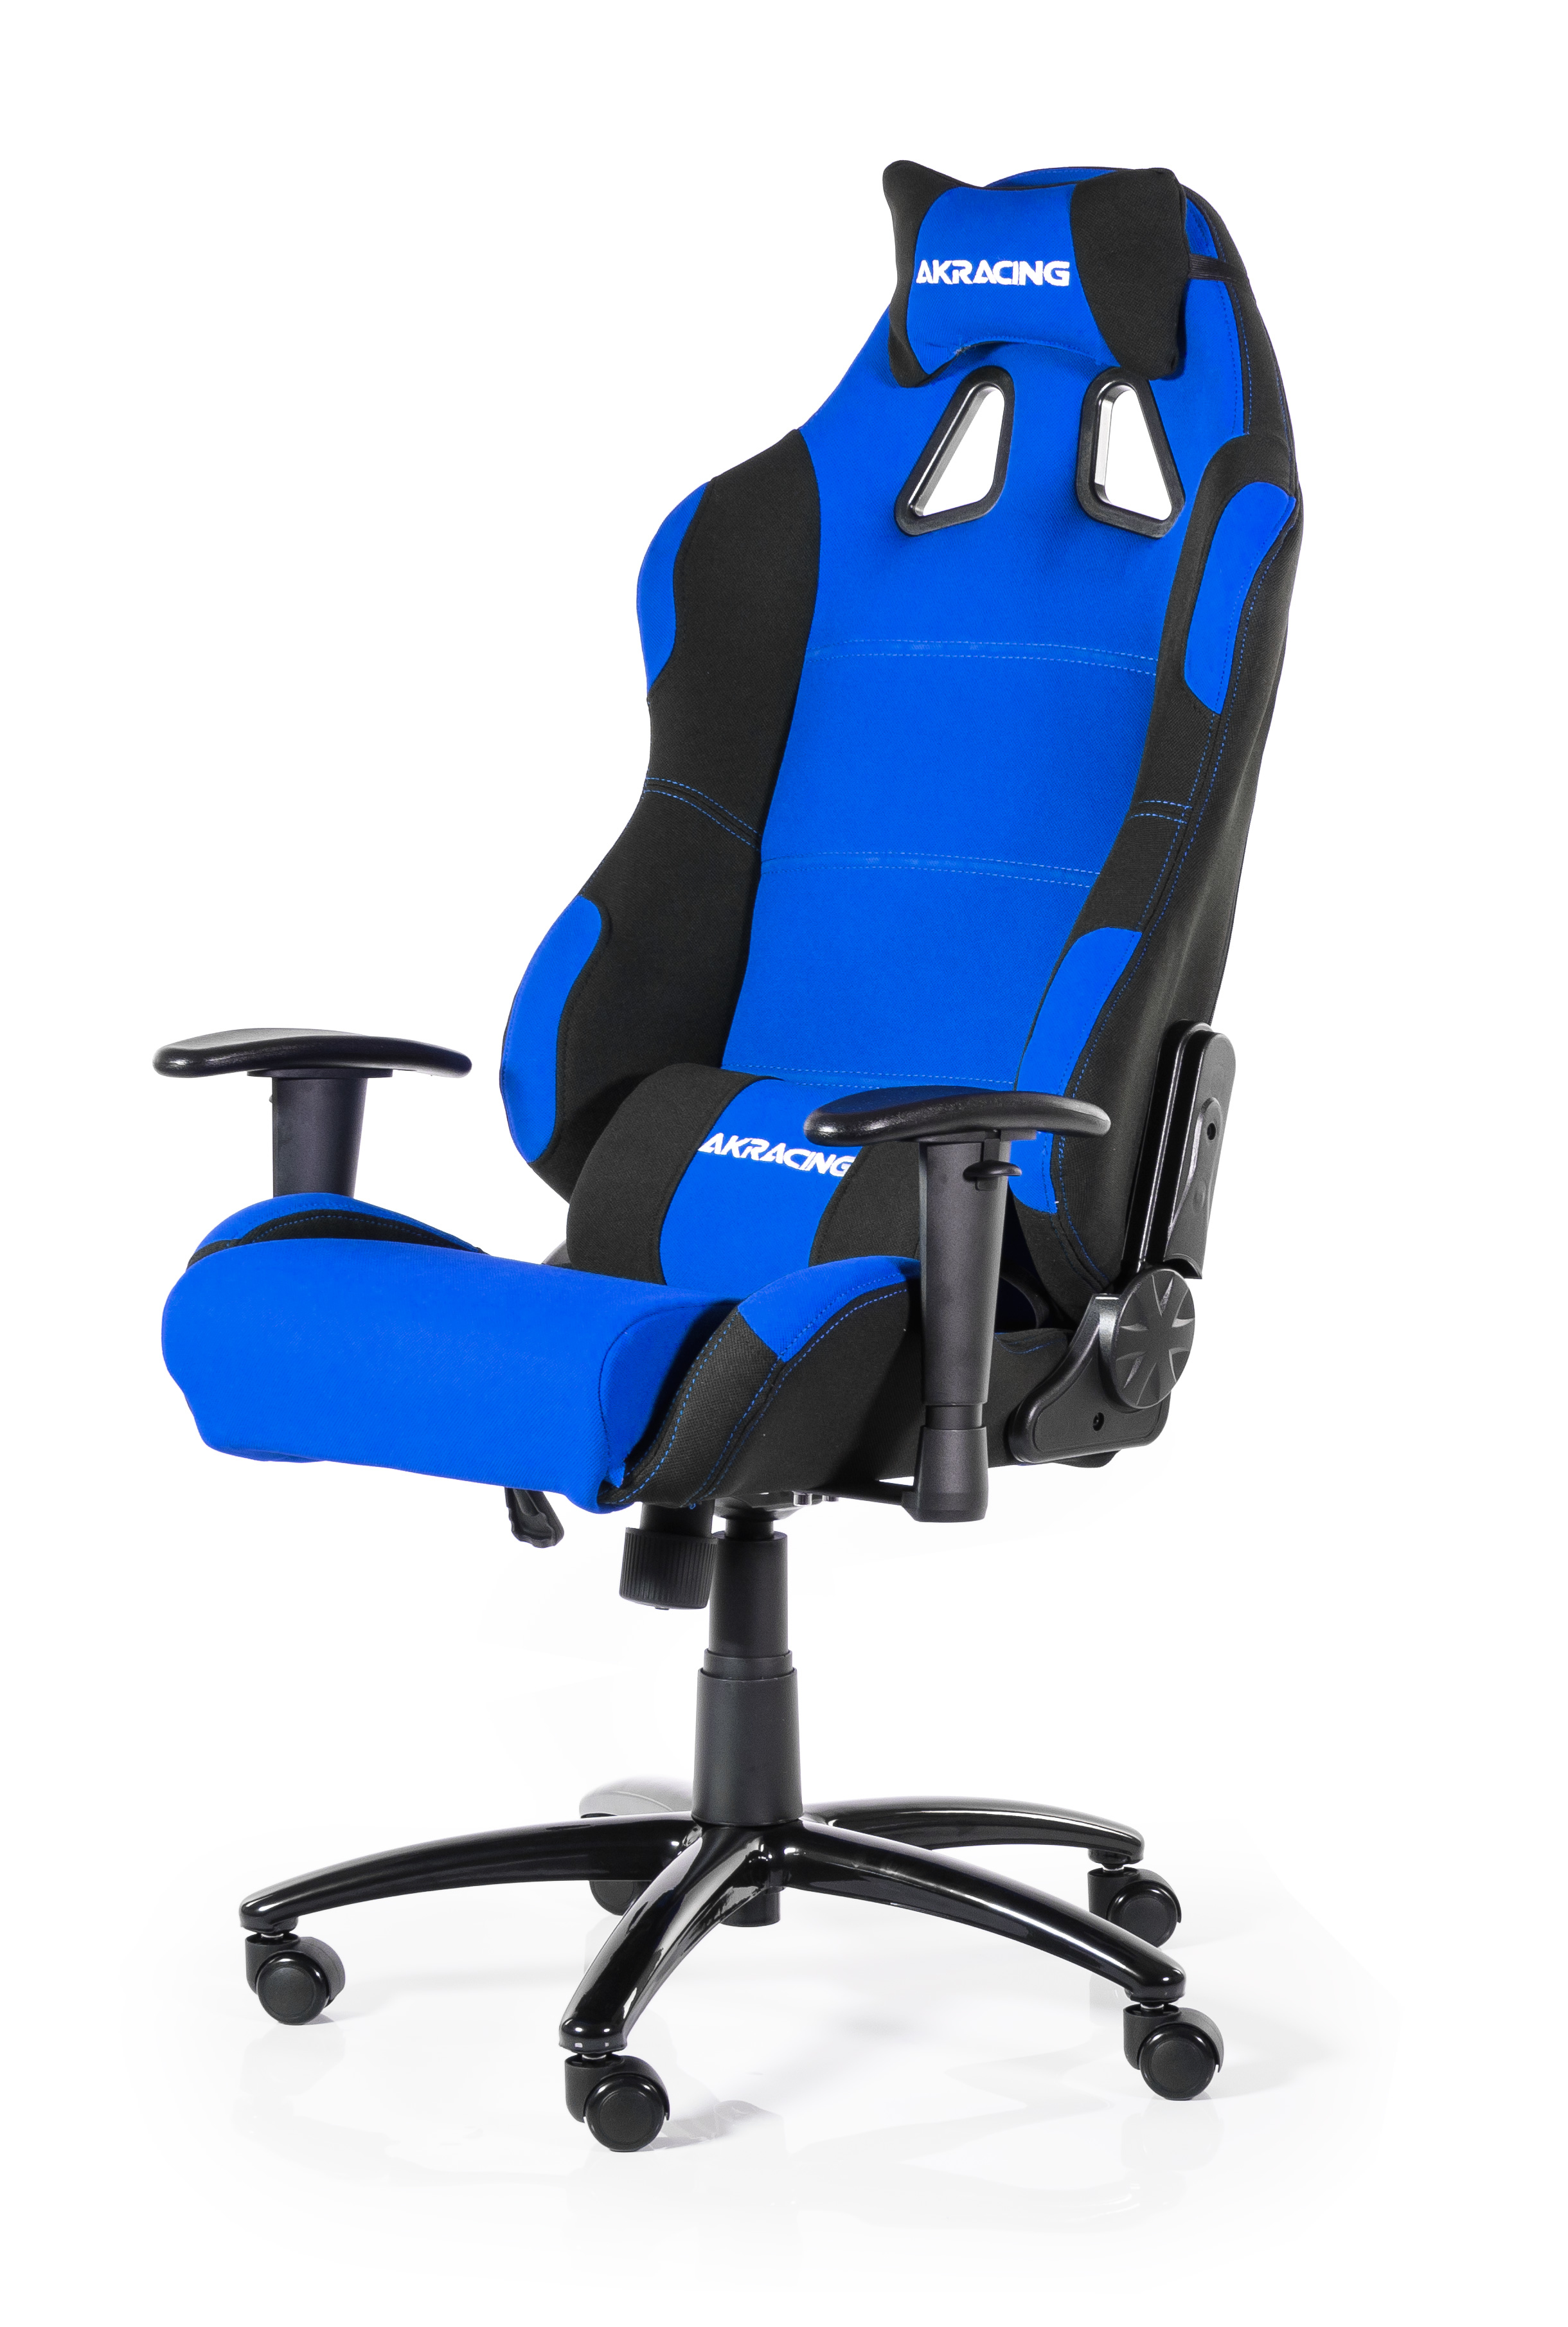 Image of AKRacing Prime PC-Spielstuhl Gepolsterter Sitz